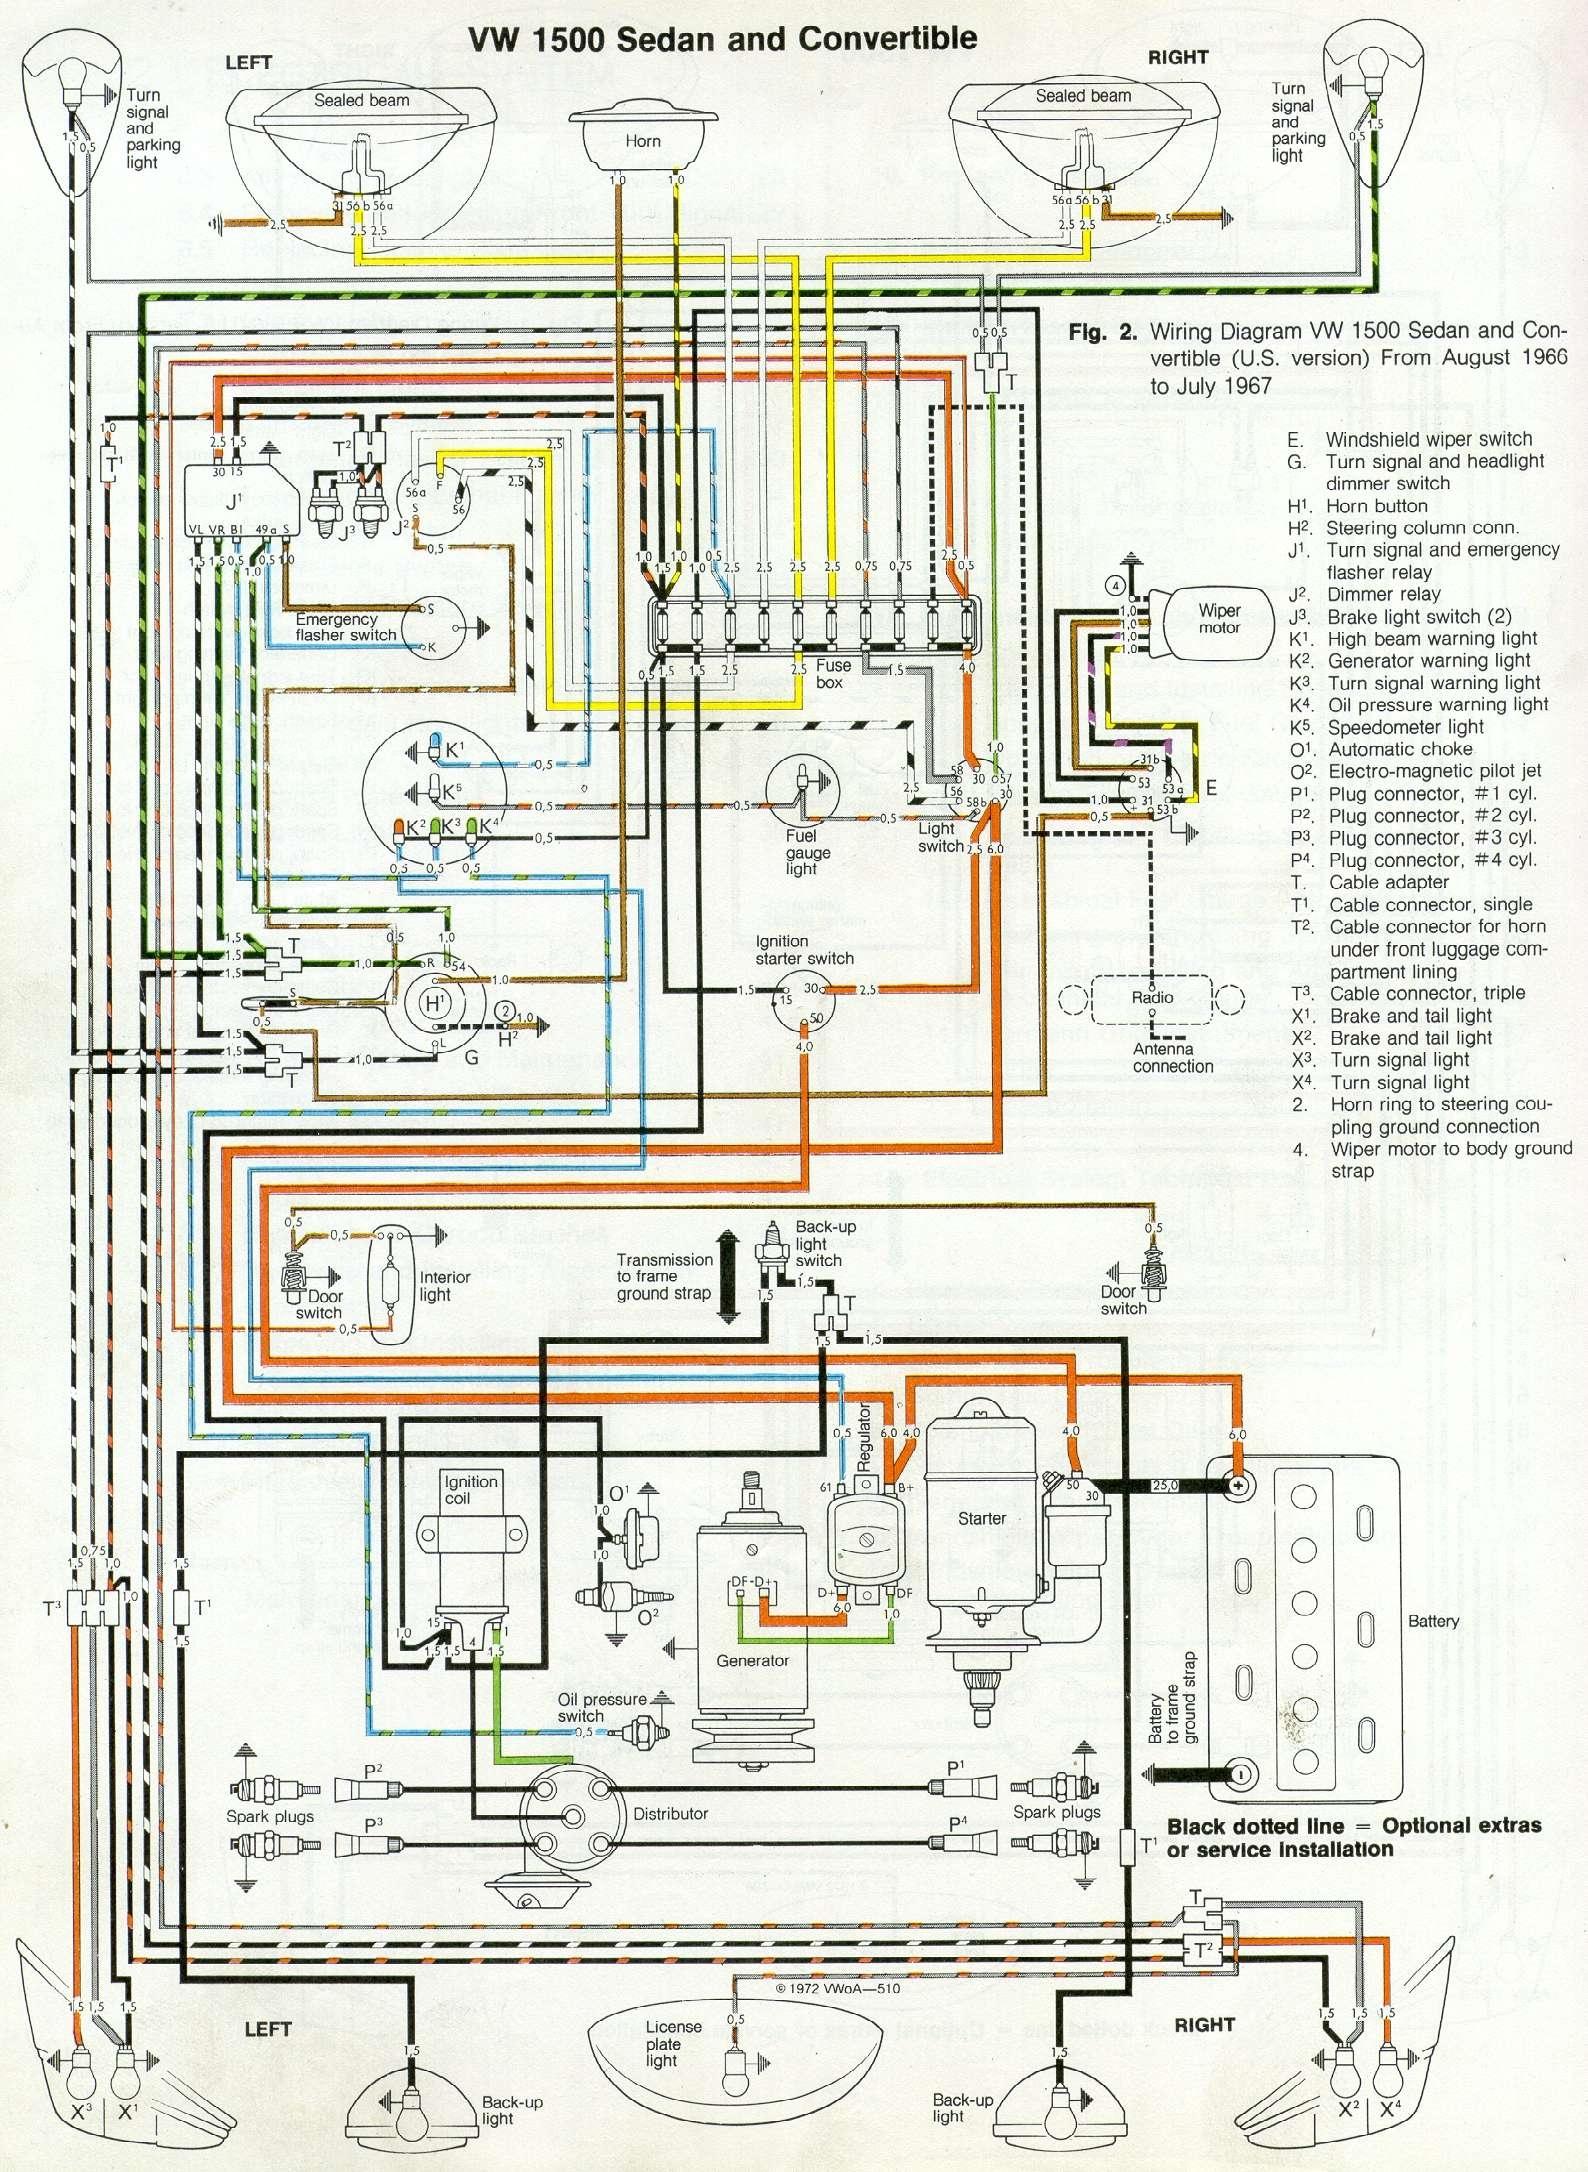 66 and 67 vw beetle wiring diagram rh 1967beetle com 1968 VW Wiring Diagram 1966 vw beetle wiring diagram